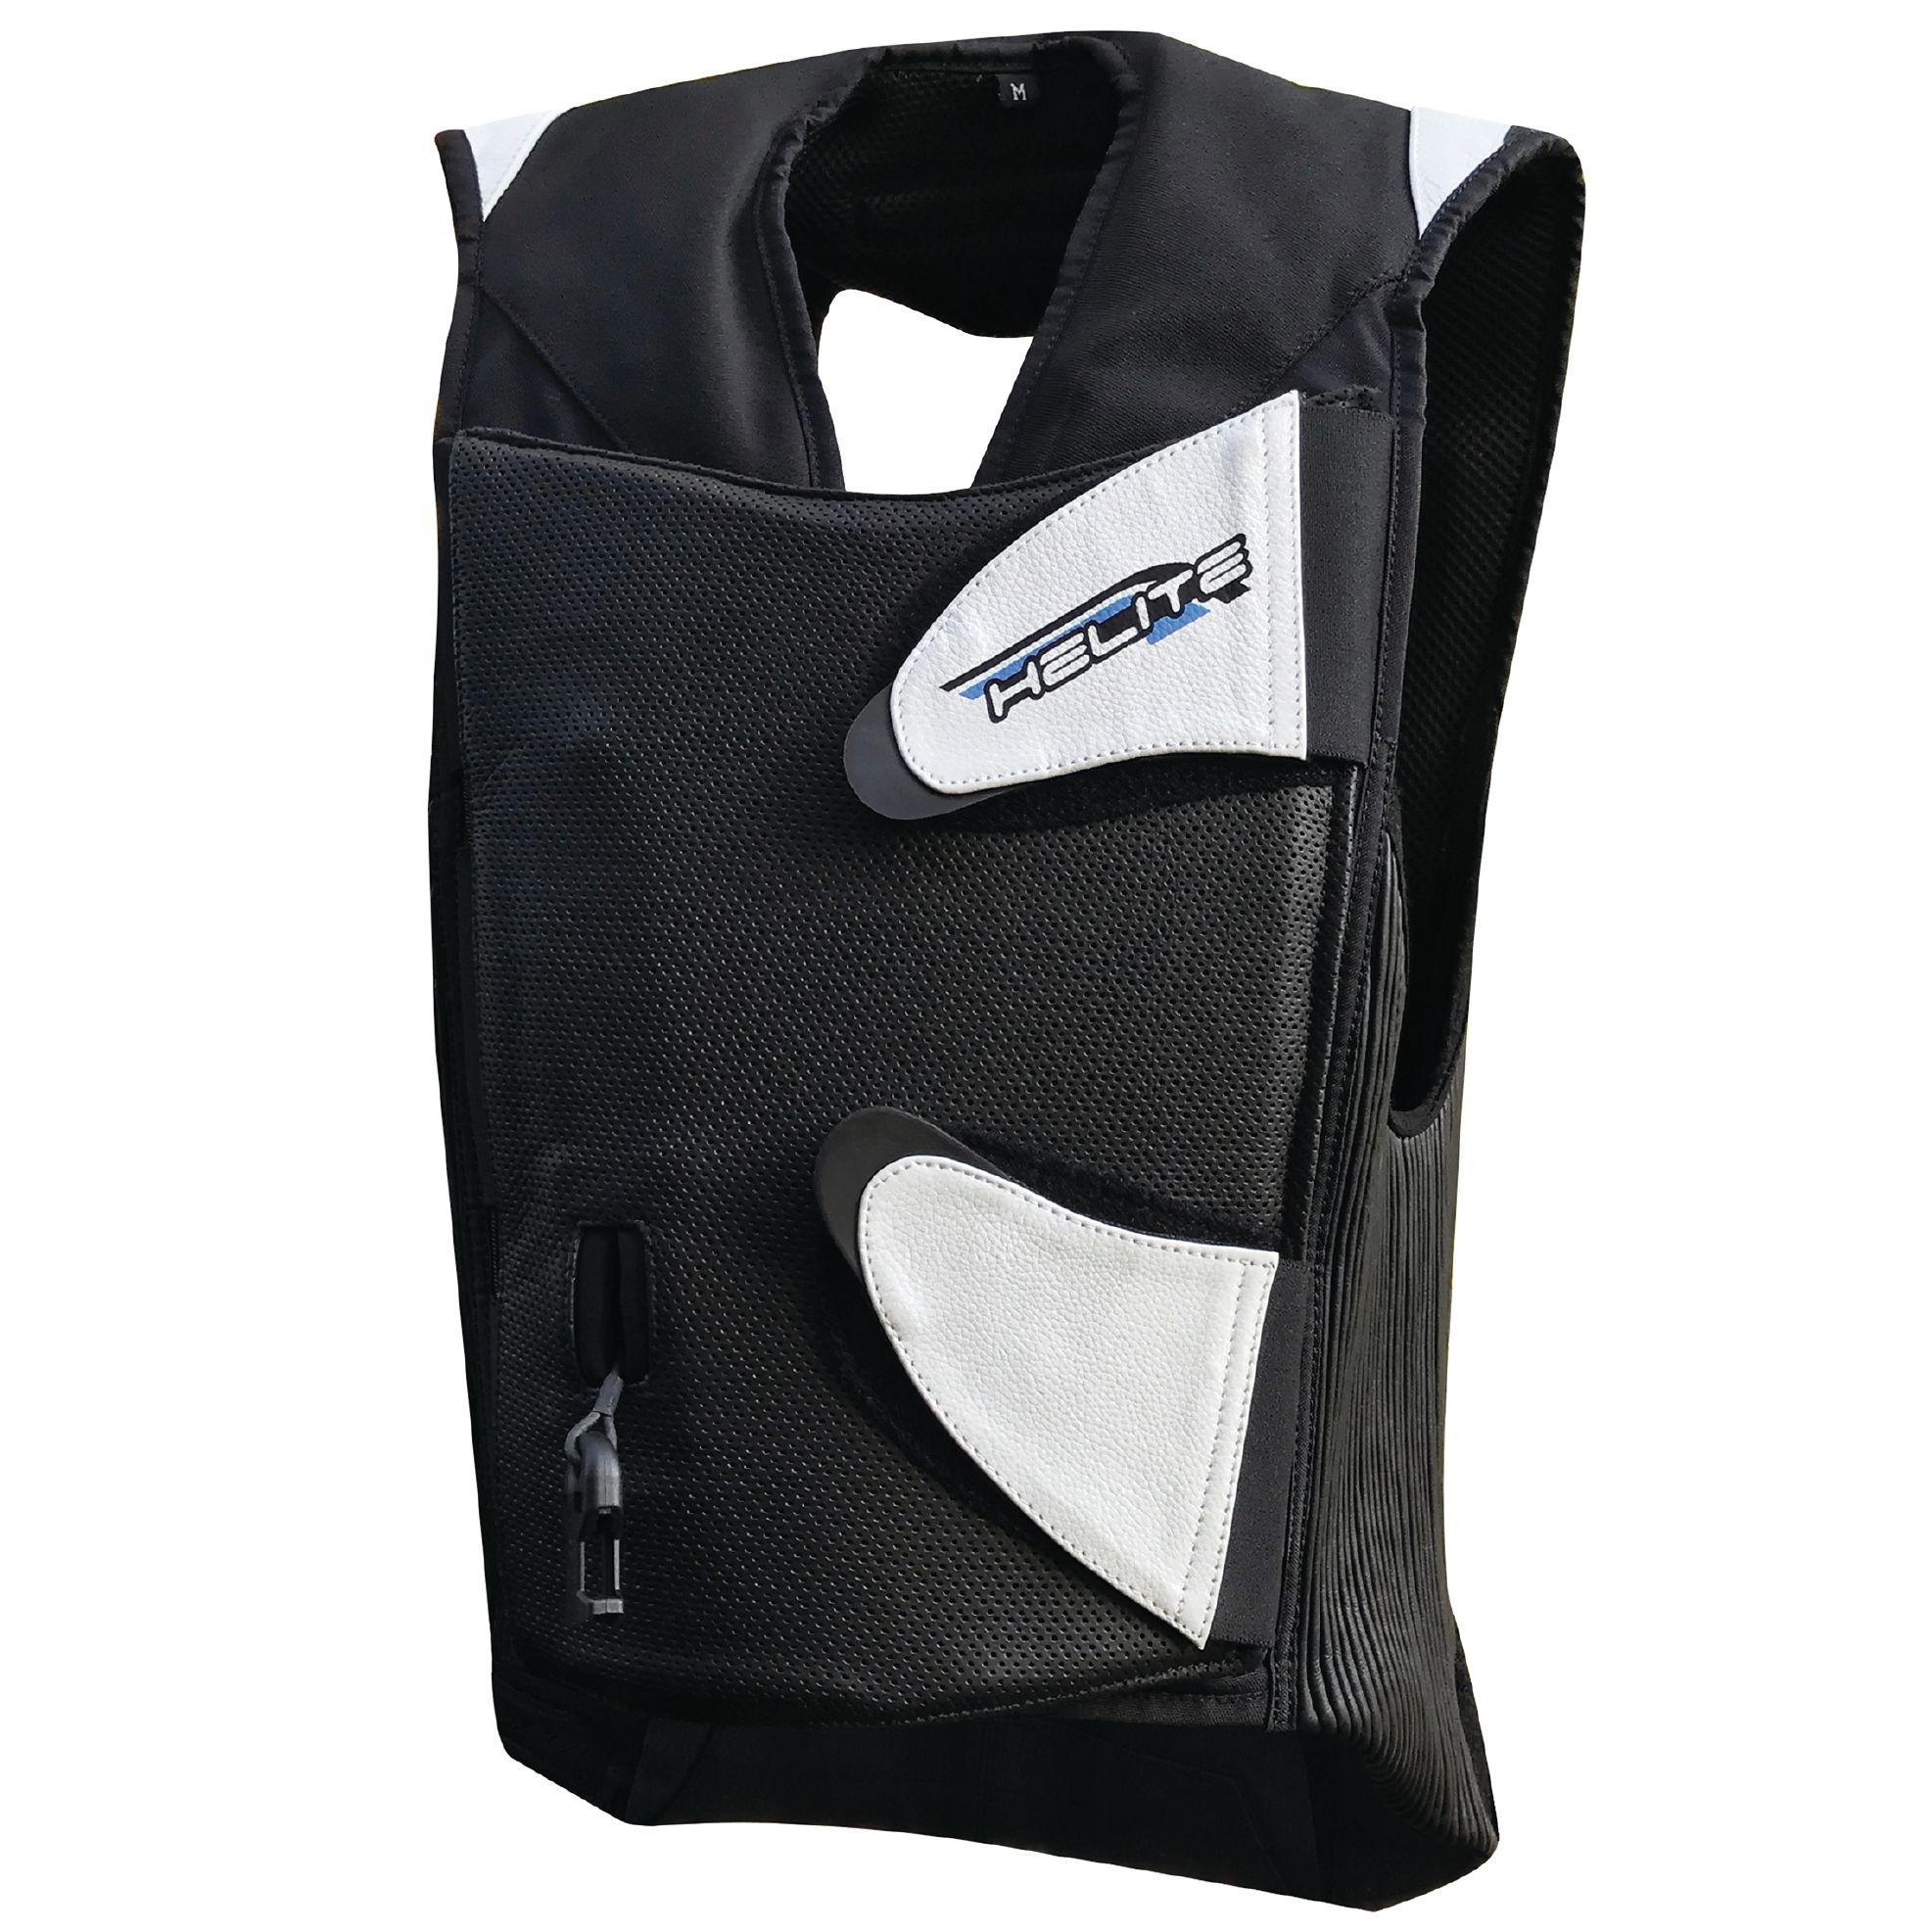 gilet airbag helite gp air cuir blouson et veste. Black Bedroom Furniture Sets. Home Design Ideas